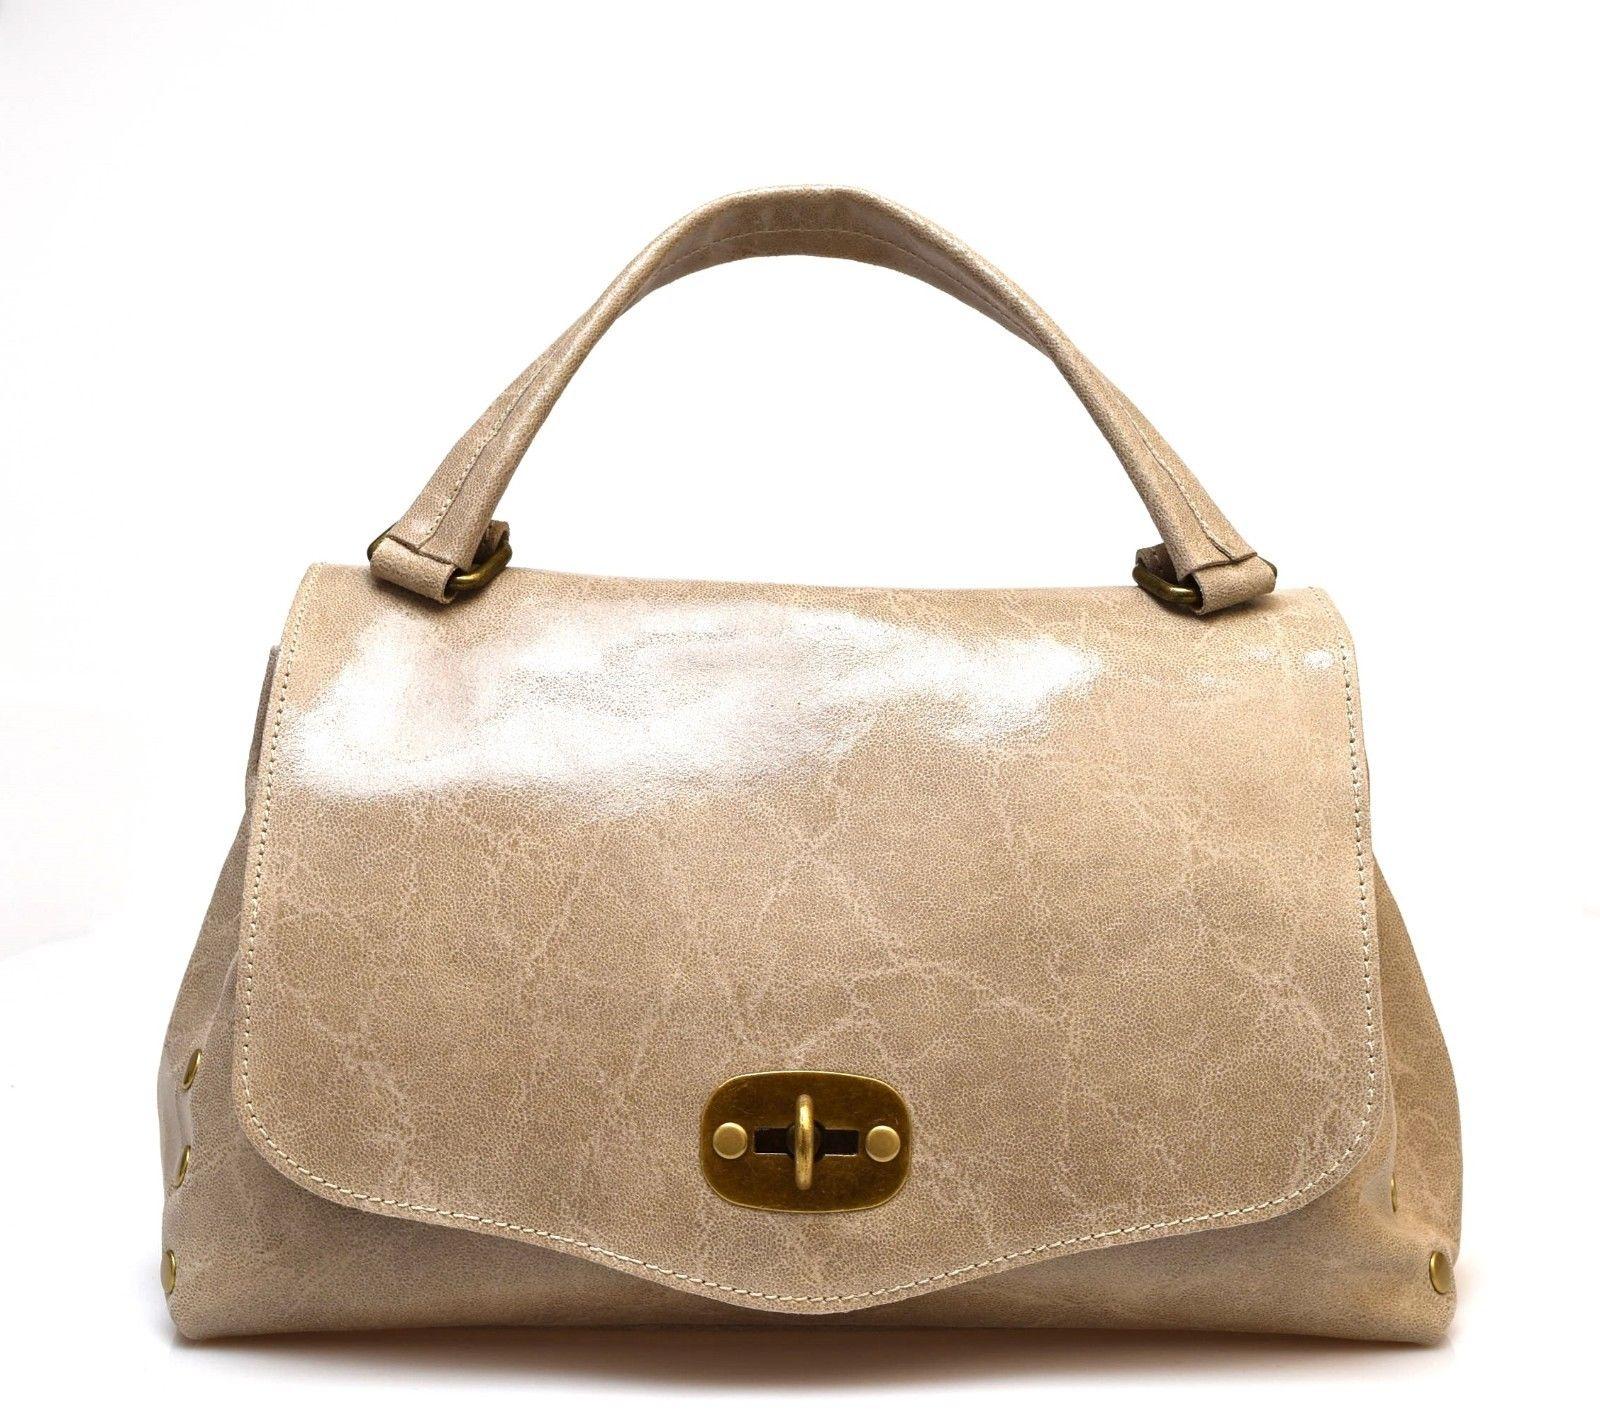 HAND BAG 07 Borsa a mano modello postino  78137761d2b